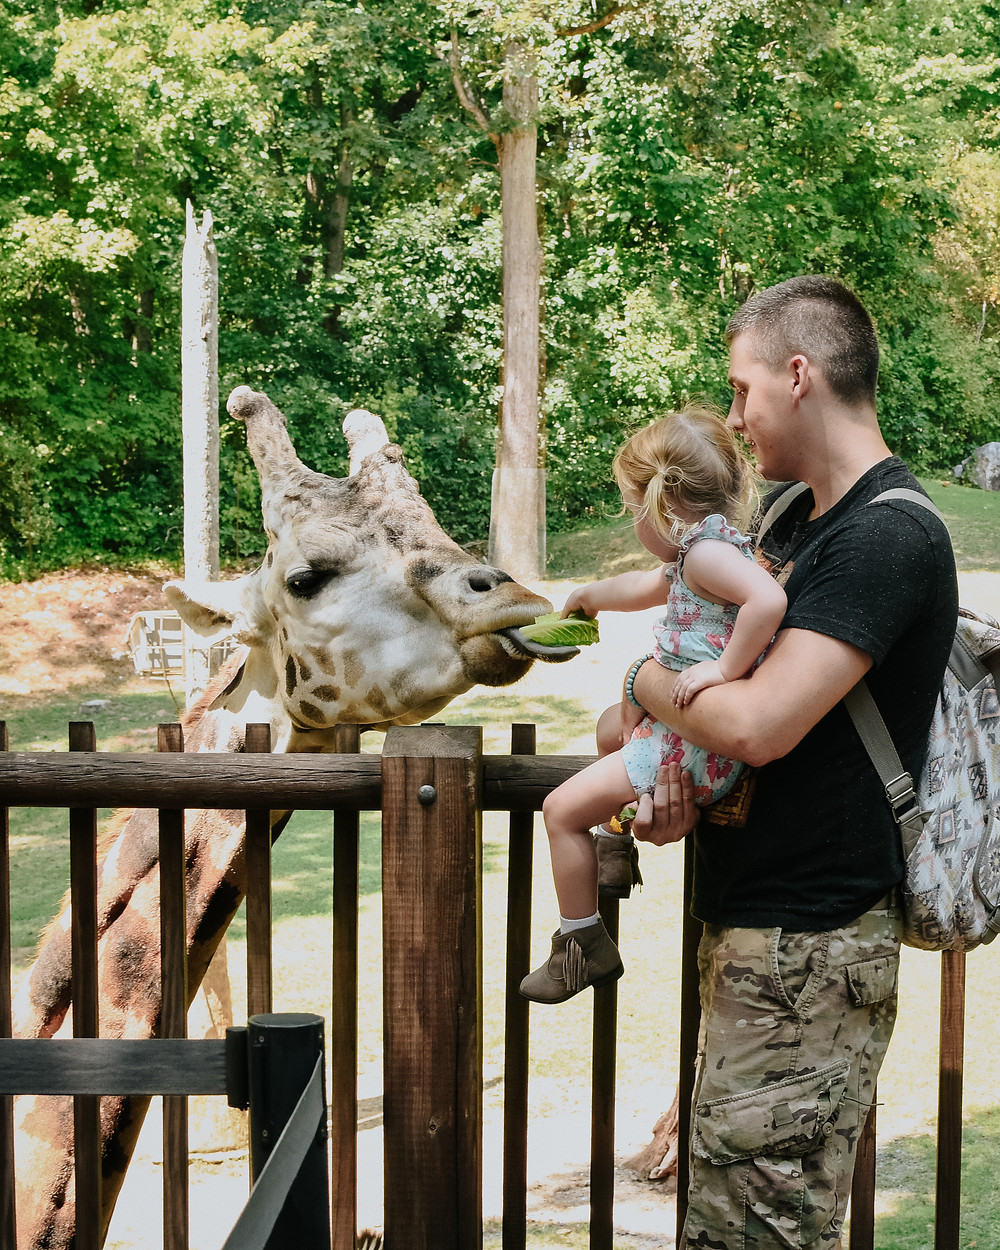 Clementine feeding giraffe